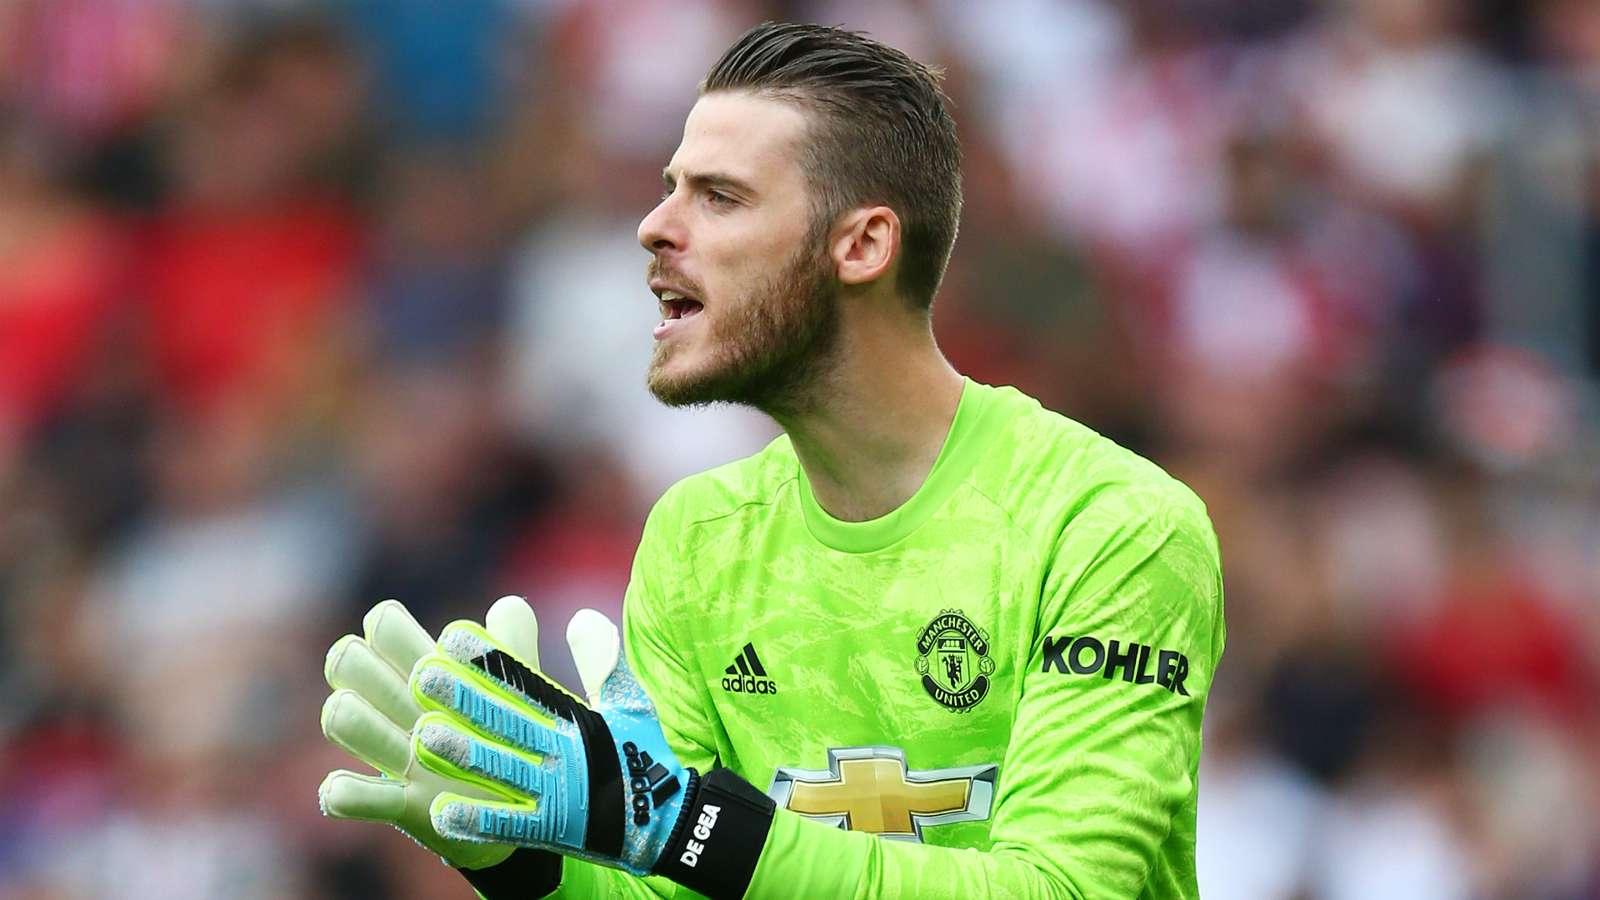 De Gea not irreplaceable if he leaves Man Utd - Van der Sar - Bóng Đá